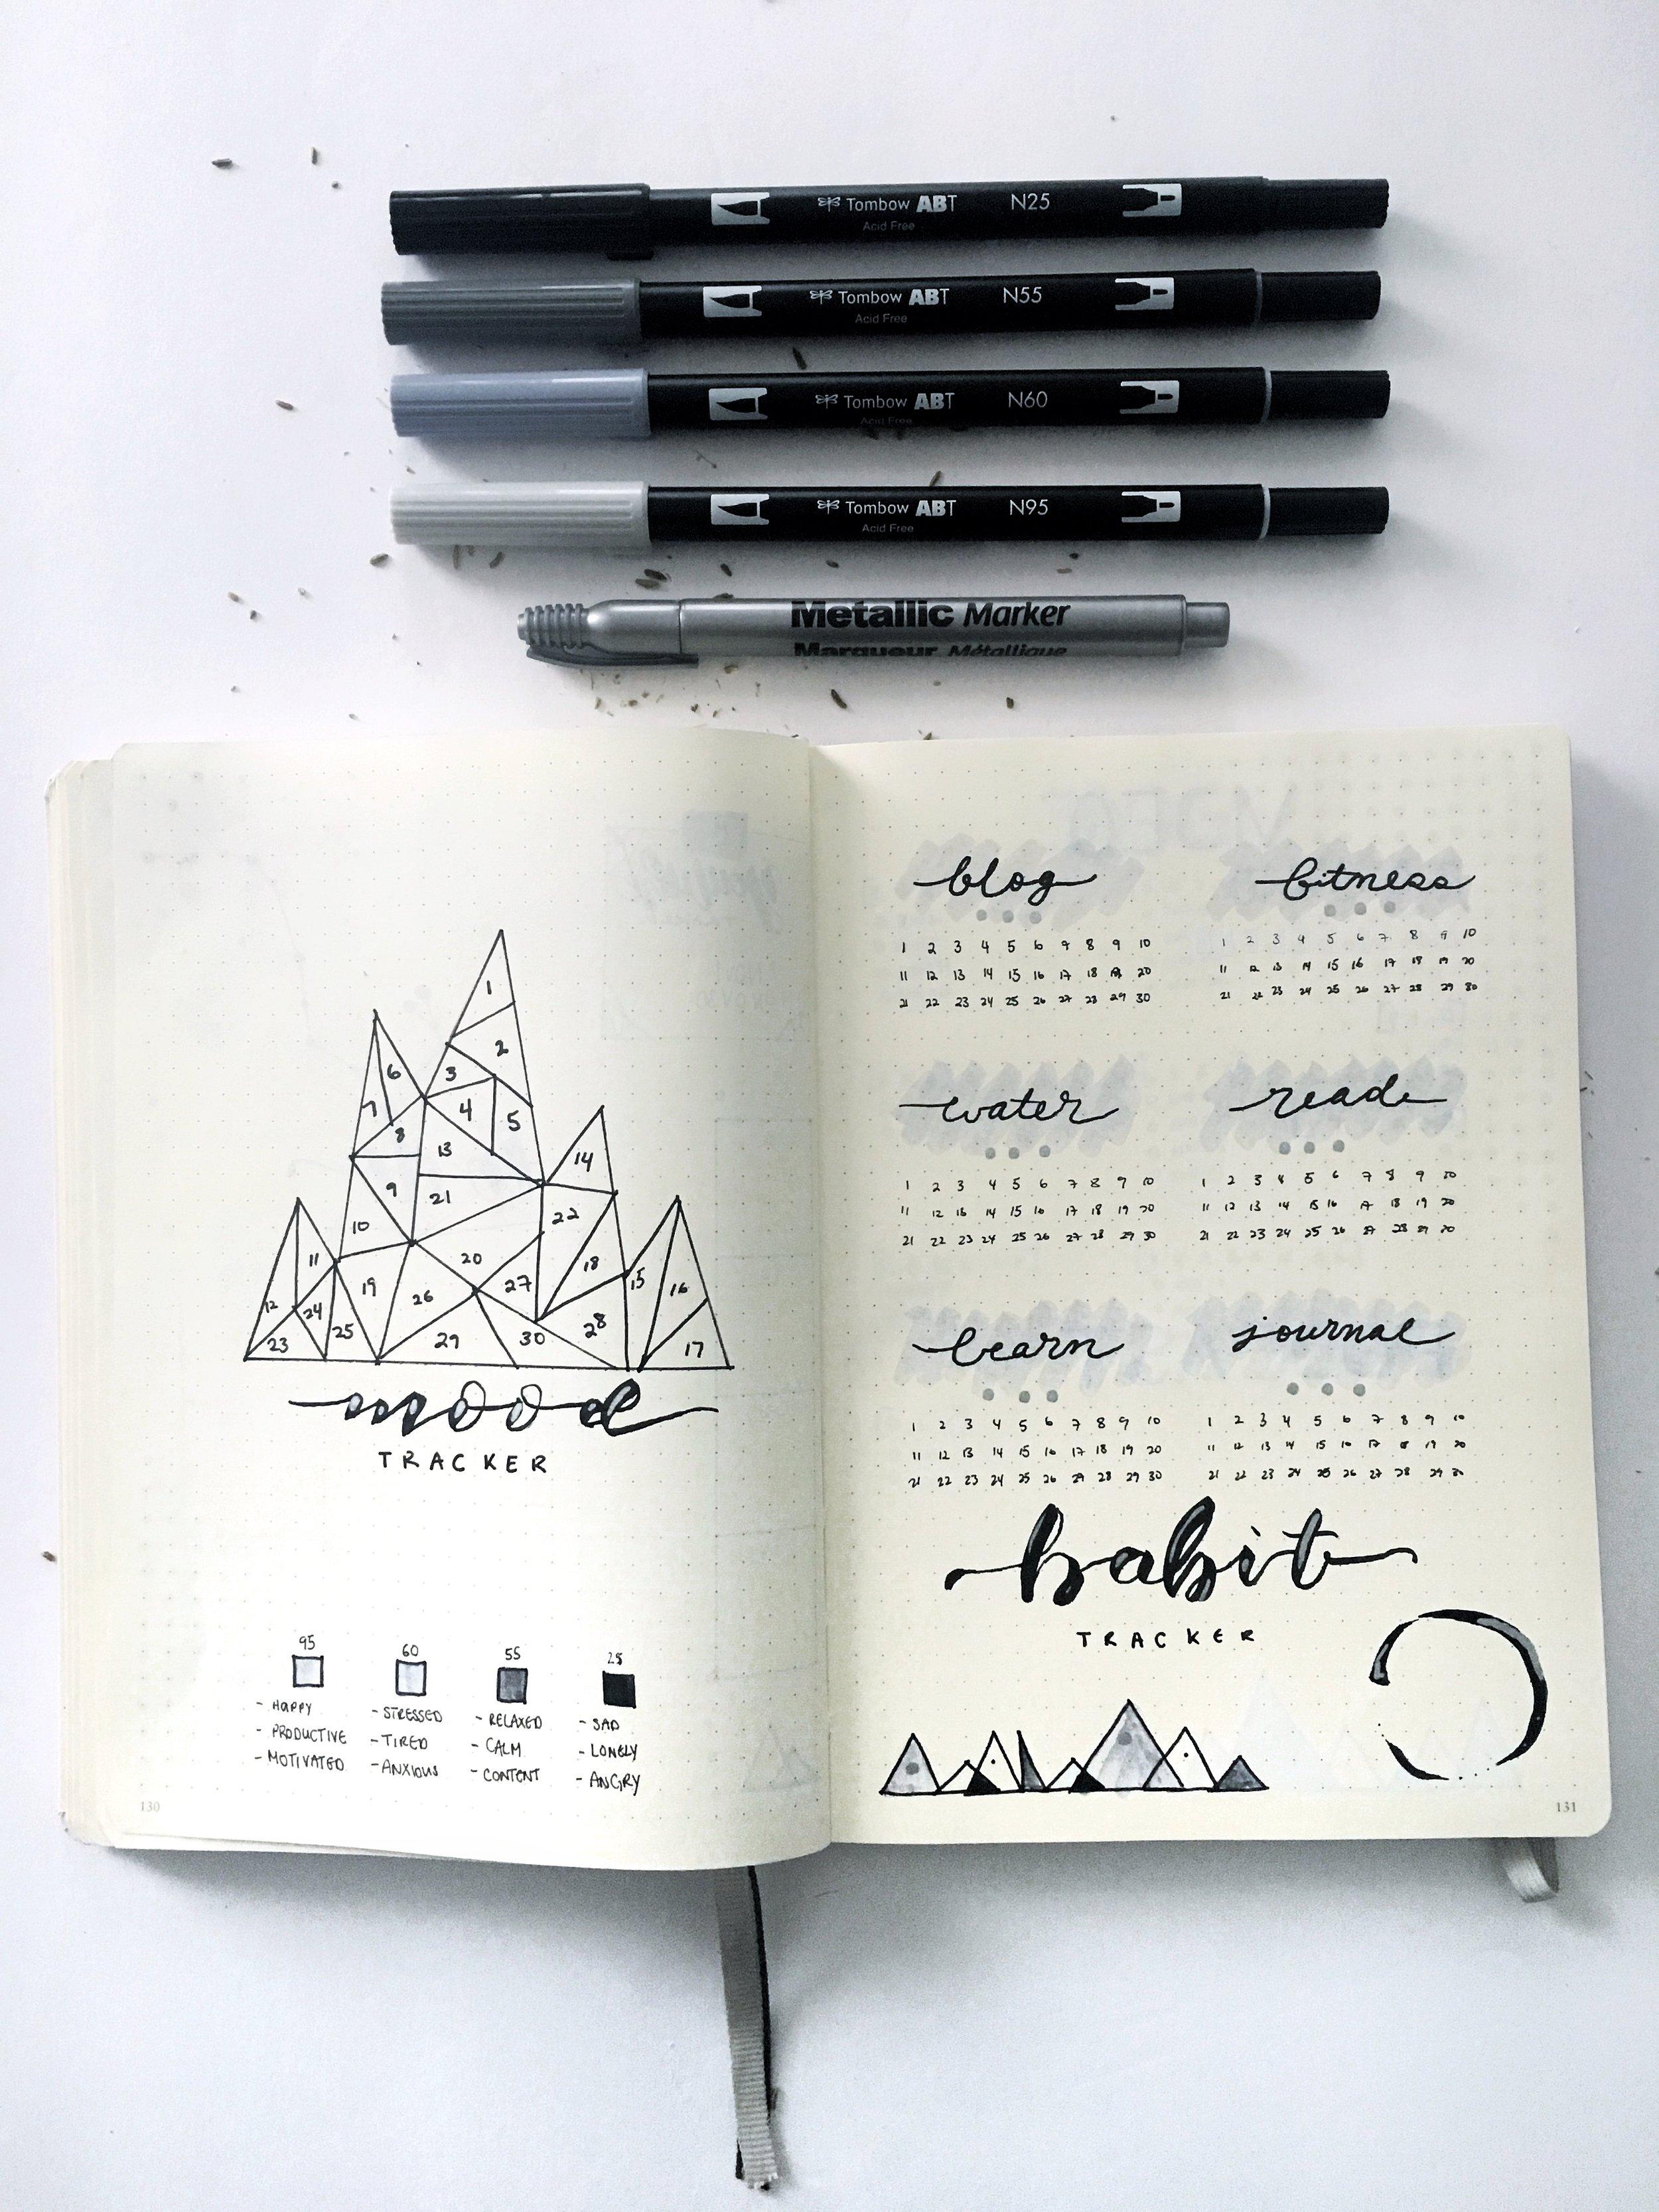 bojo nov 2018 mood and habit tracker